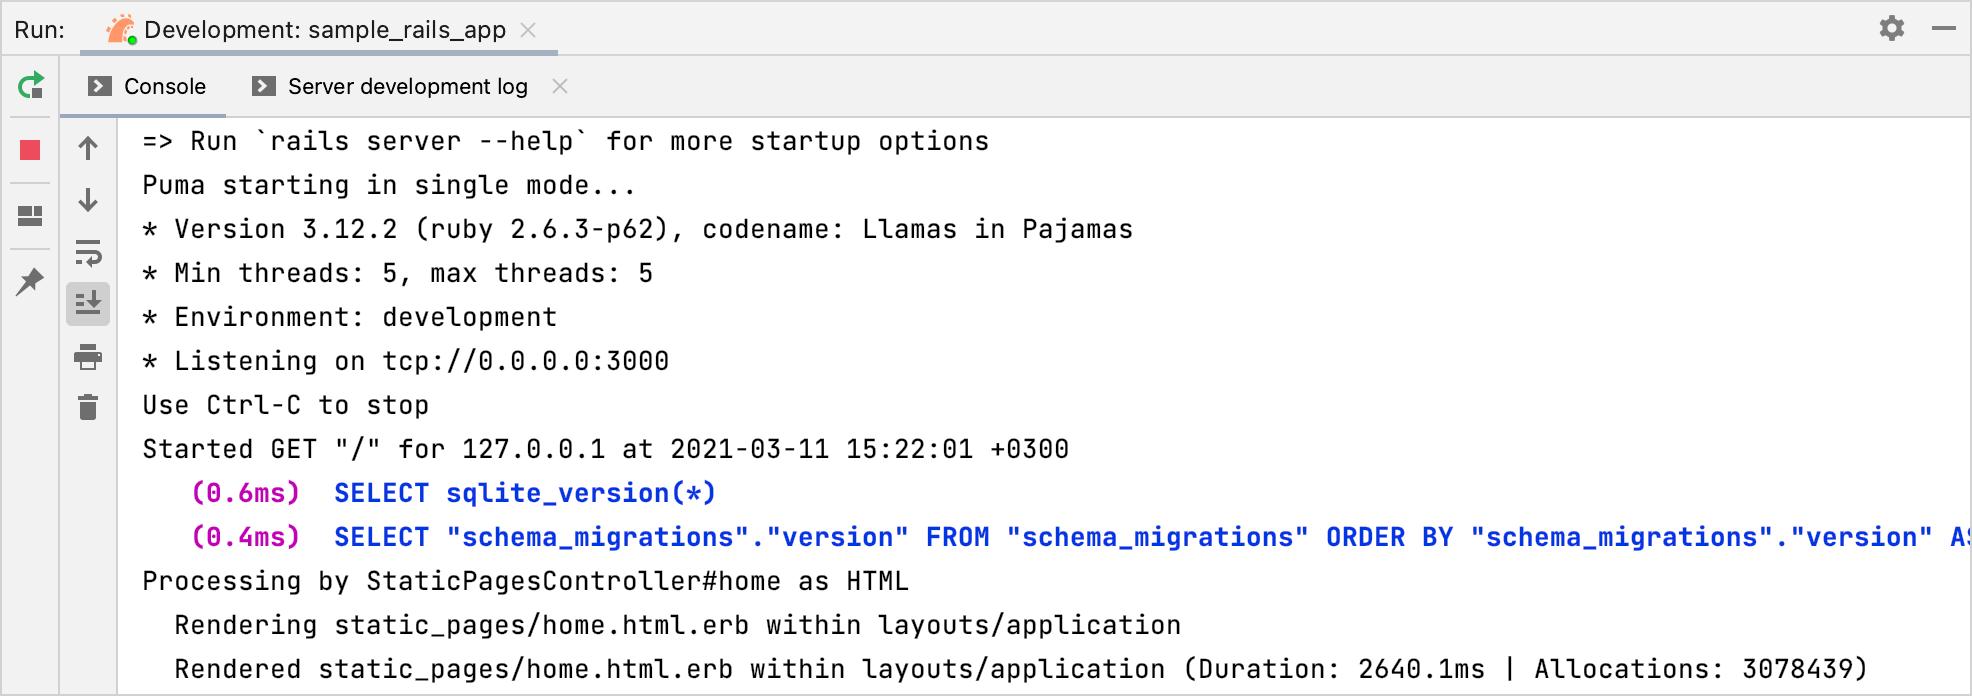 Run tool window / run Rails application